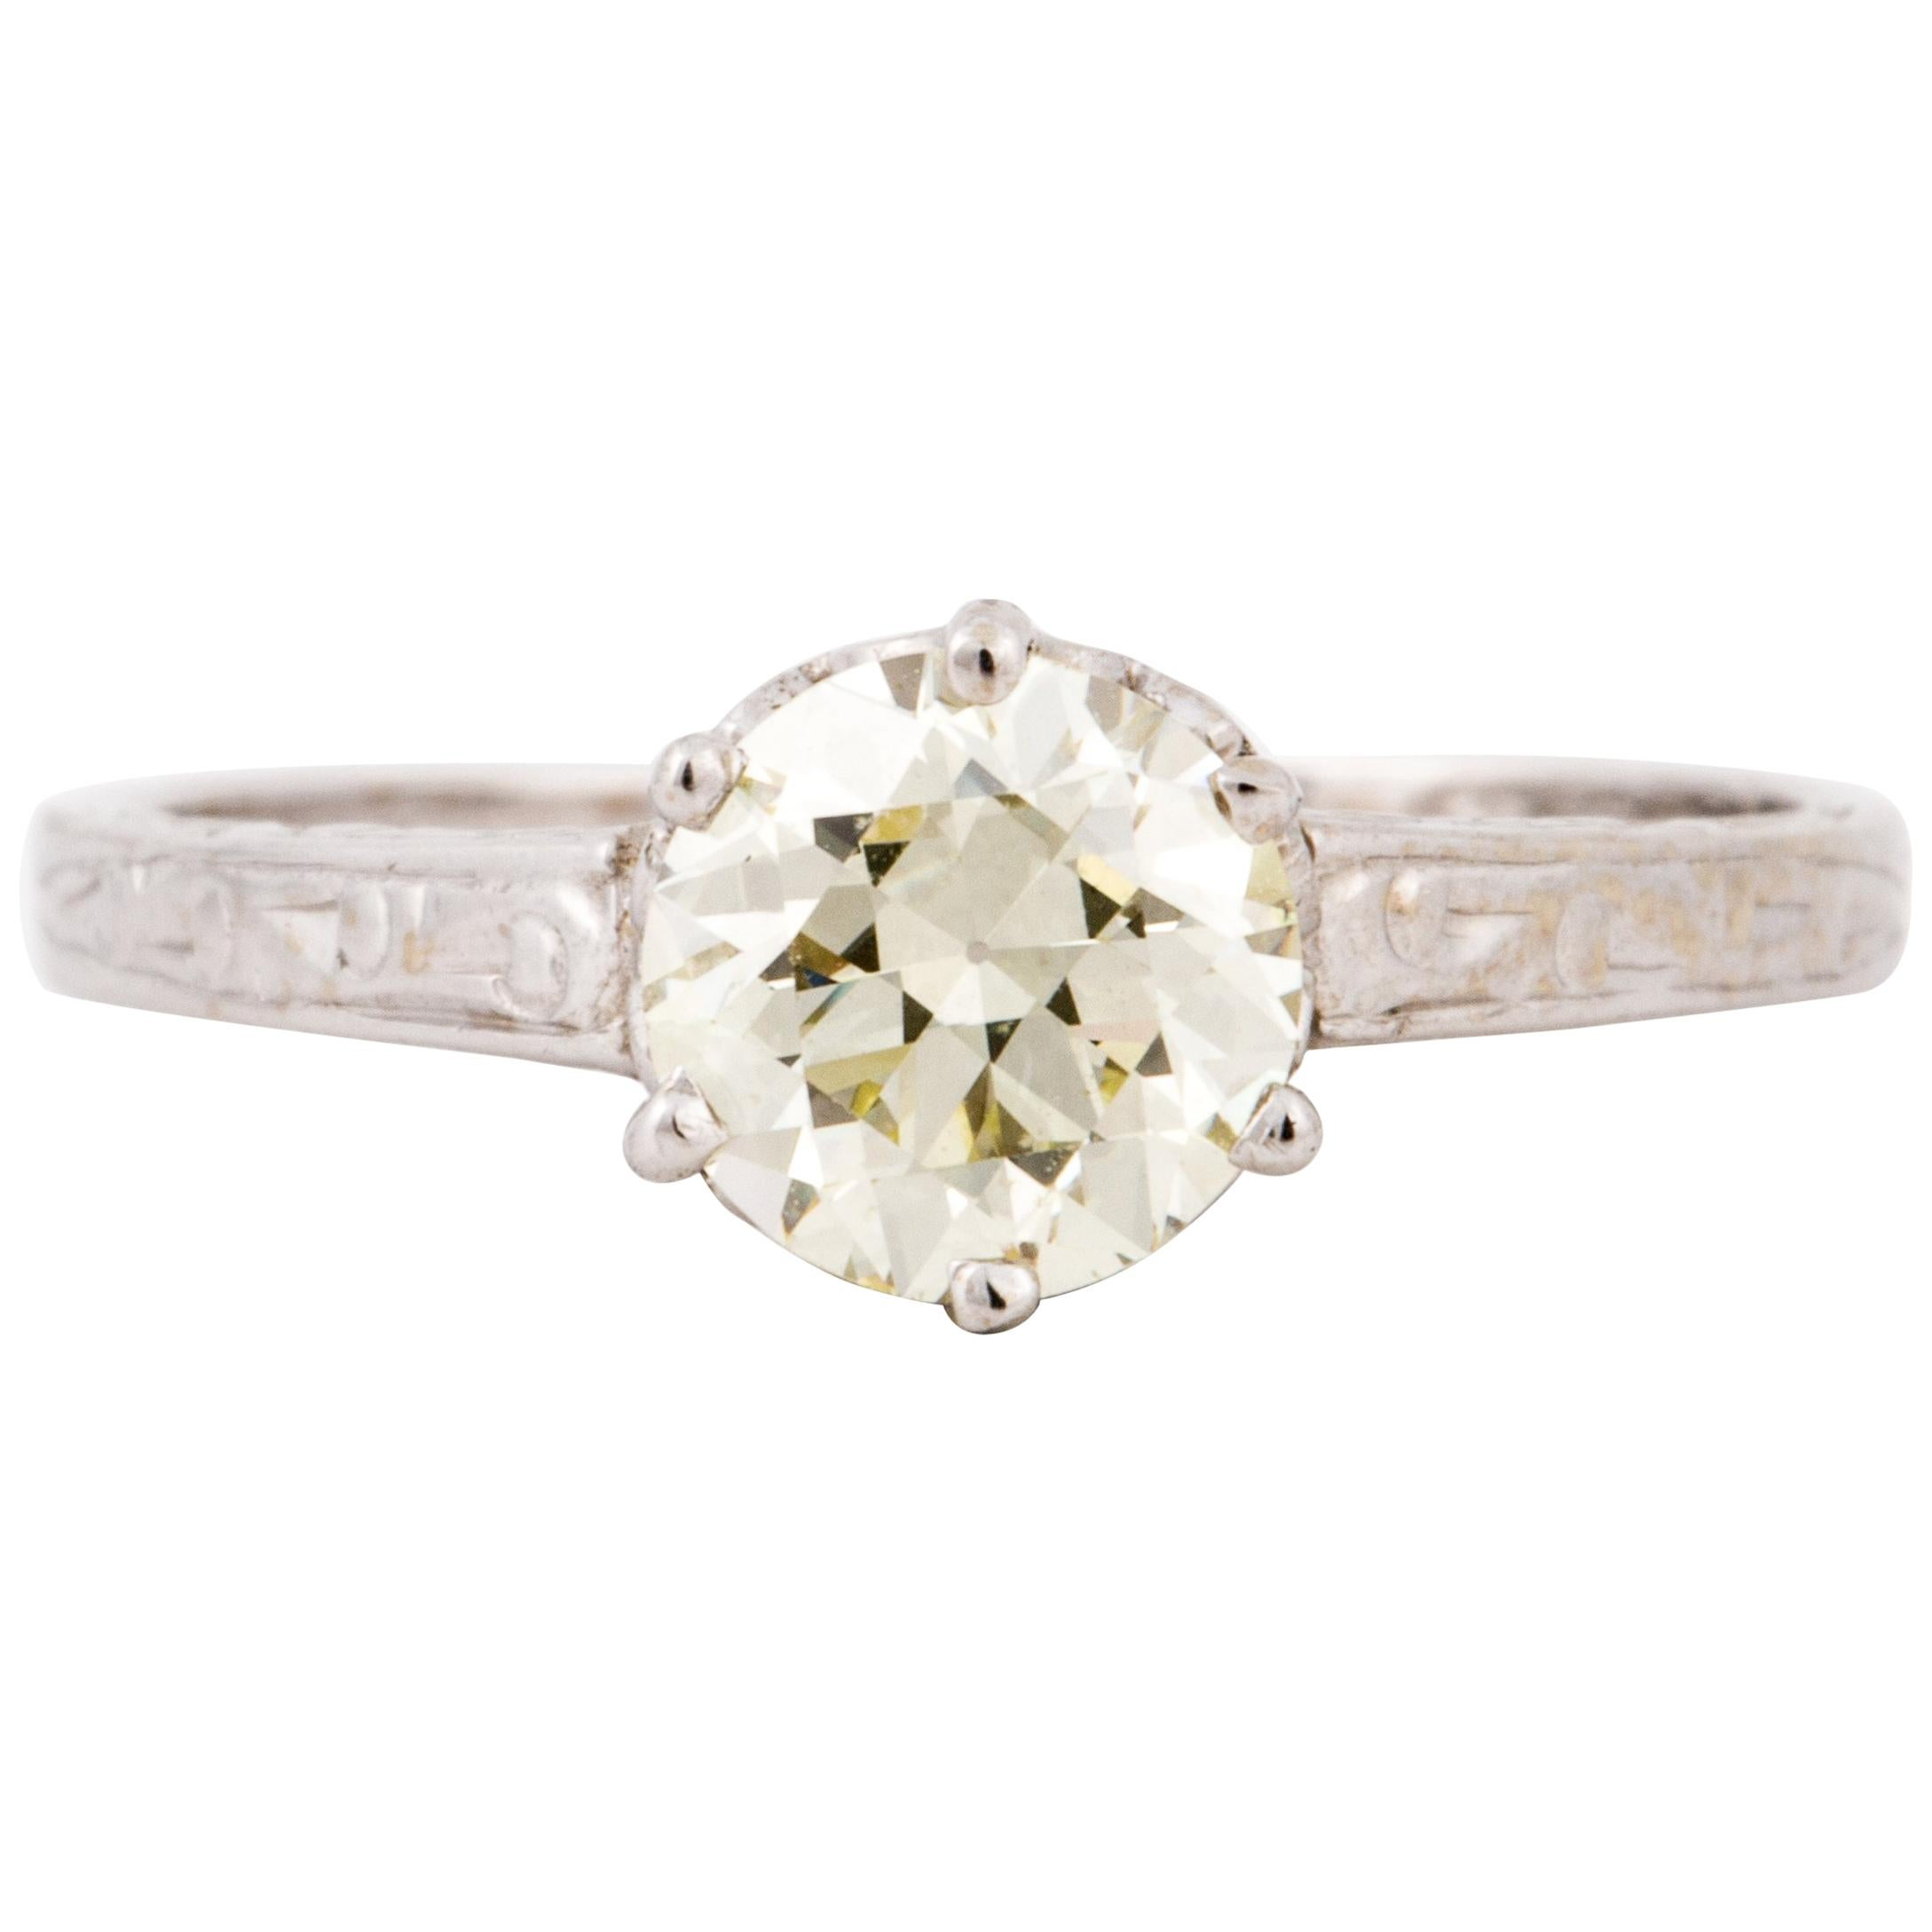 1.02 Old European Cut Diamond Solitaire Ring